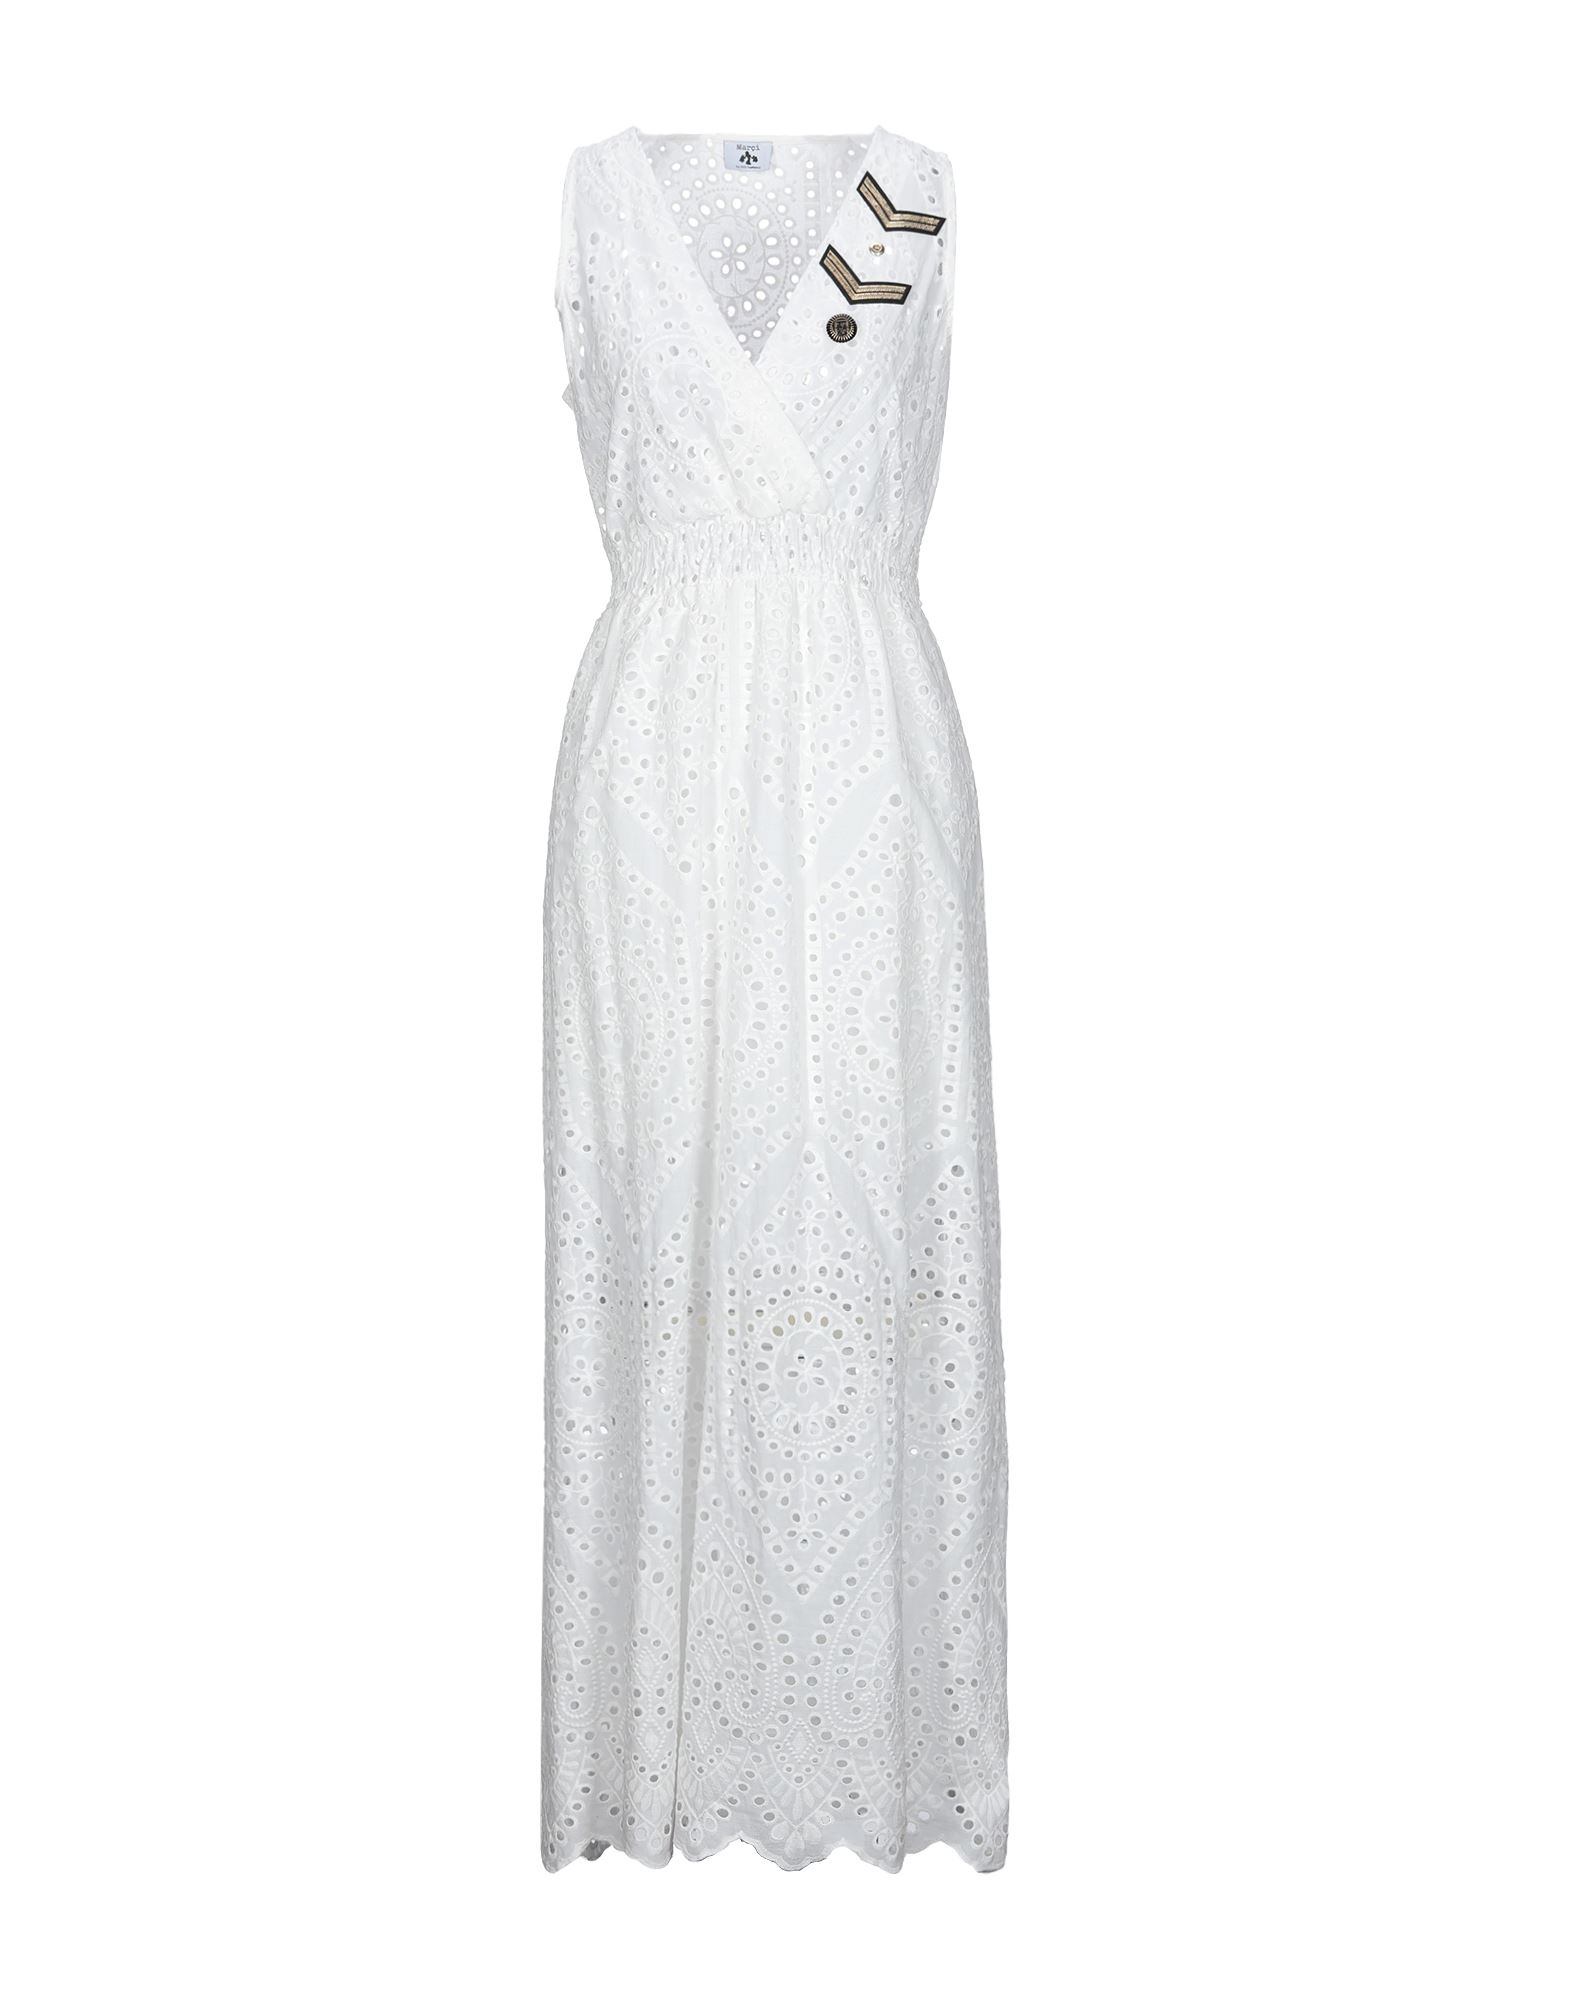 Фото - MARÇI by GIL SANTUCCI Длинное платье gil santucci длинное платье